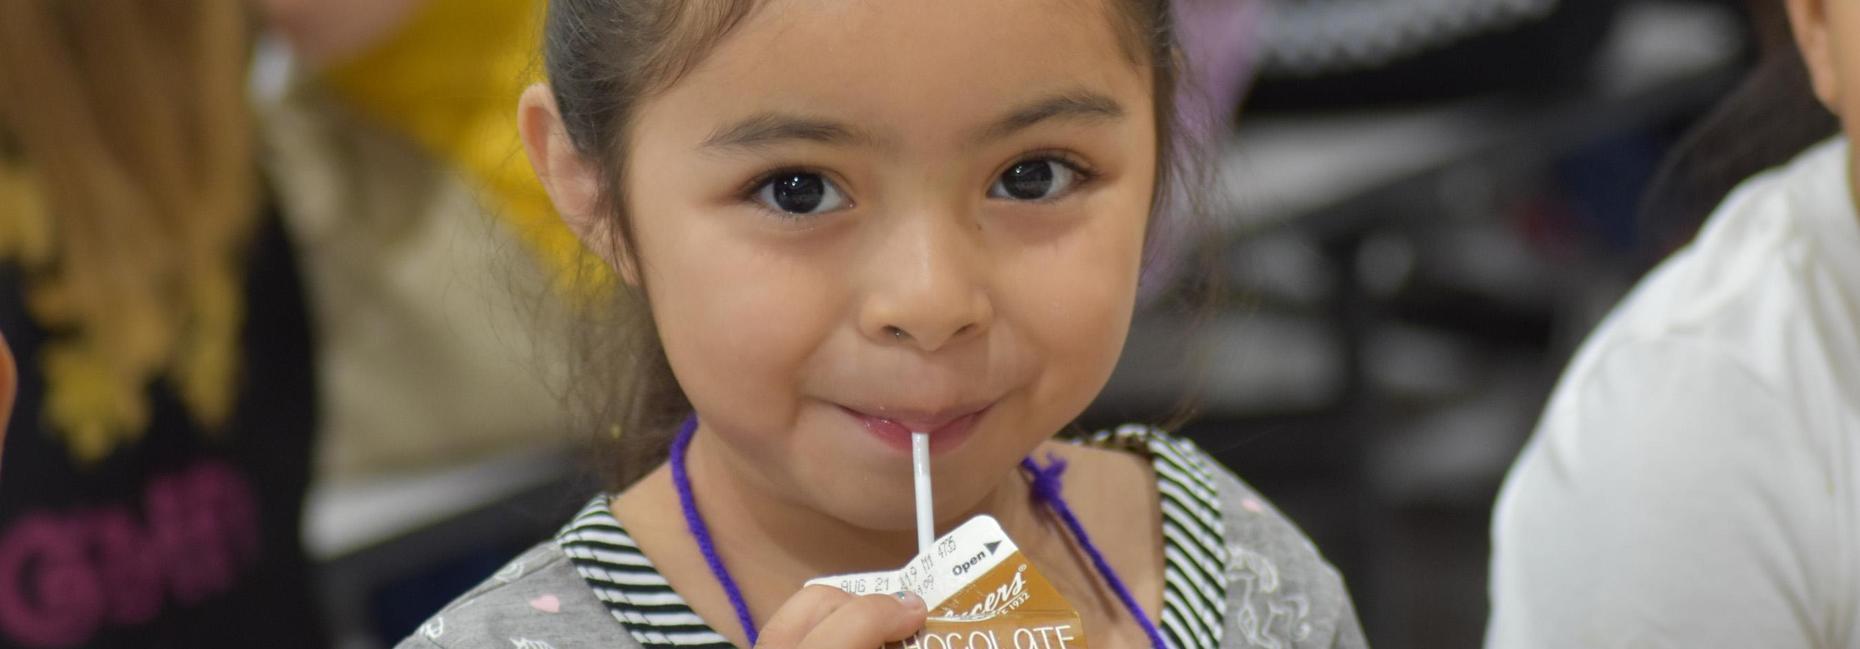 Student drinking milk